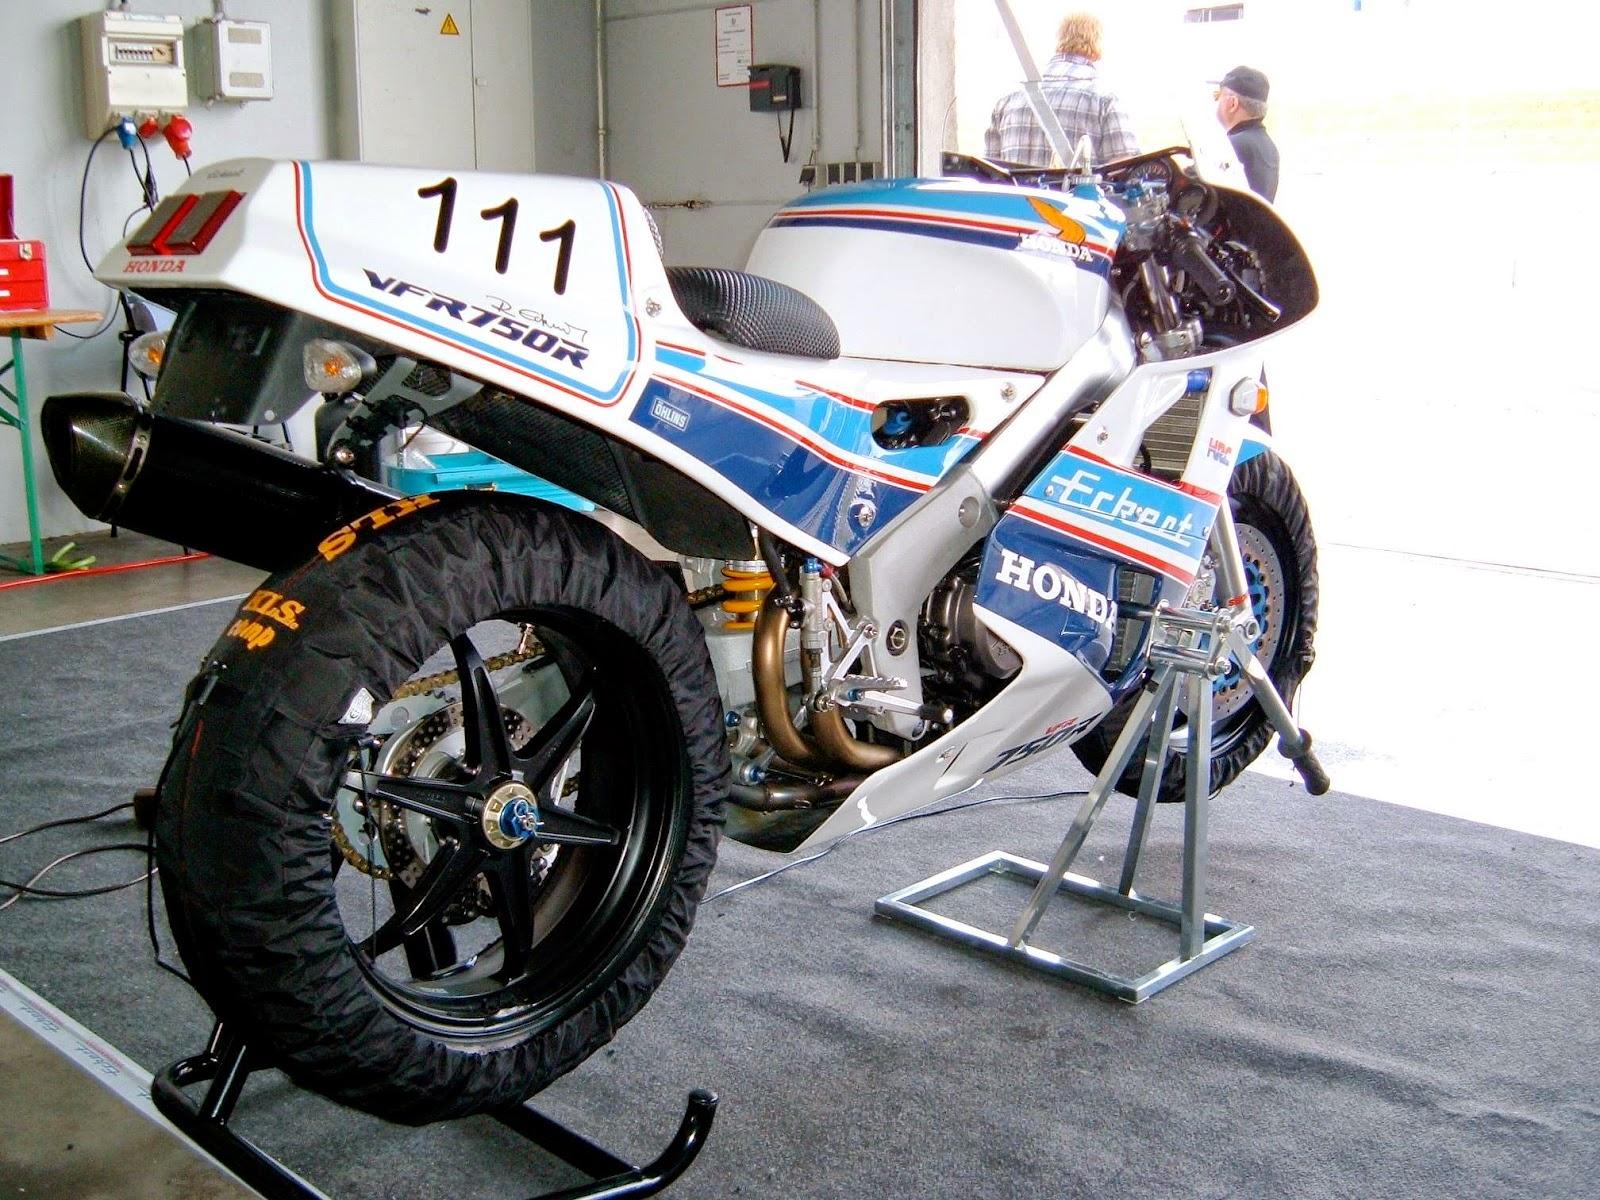 Honda RC 30 - Page 5 1400827_10202418165930562_1532177880535451517_o